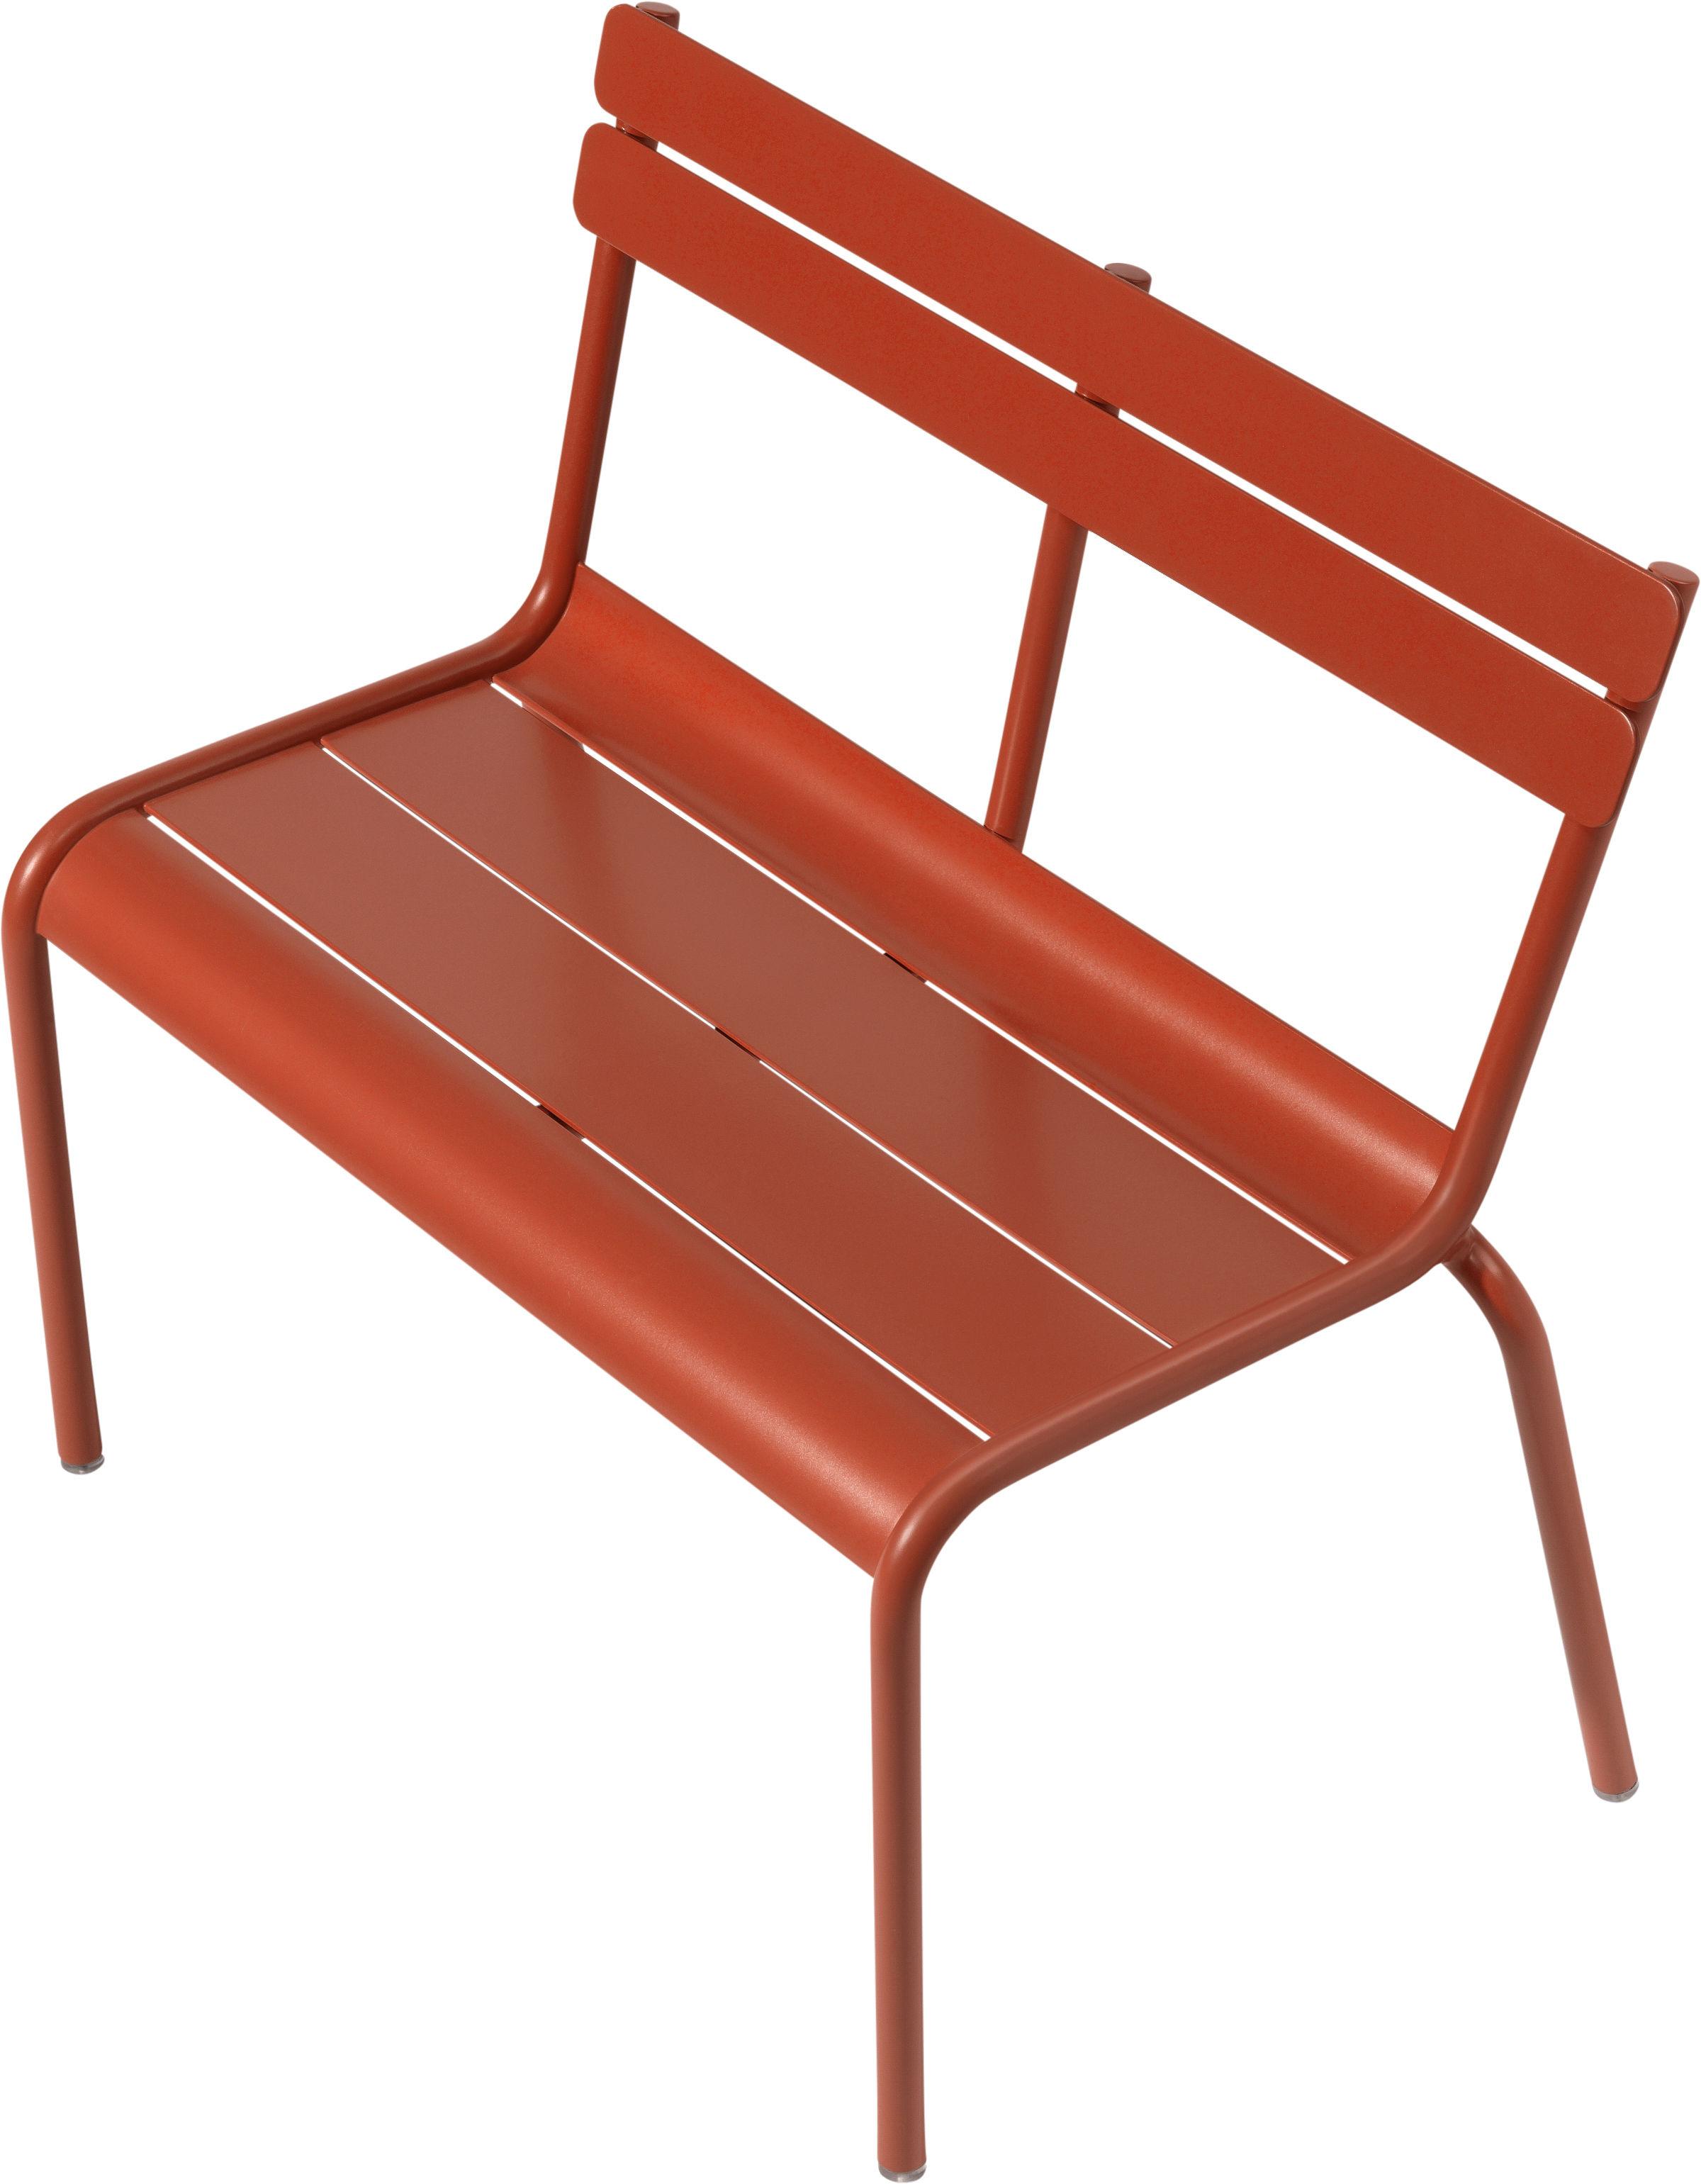 banc enfant luxembourg kid l 58 cm m tal carotte fermob. Black Bedroom Furniture Sets. Home Design Ideas